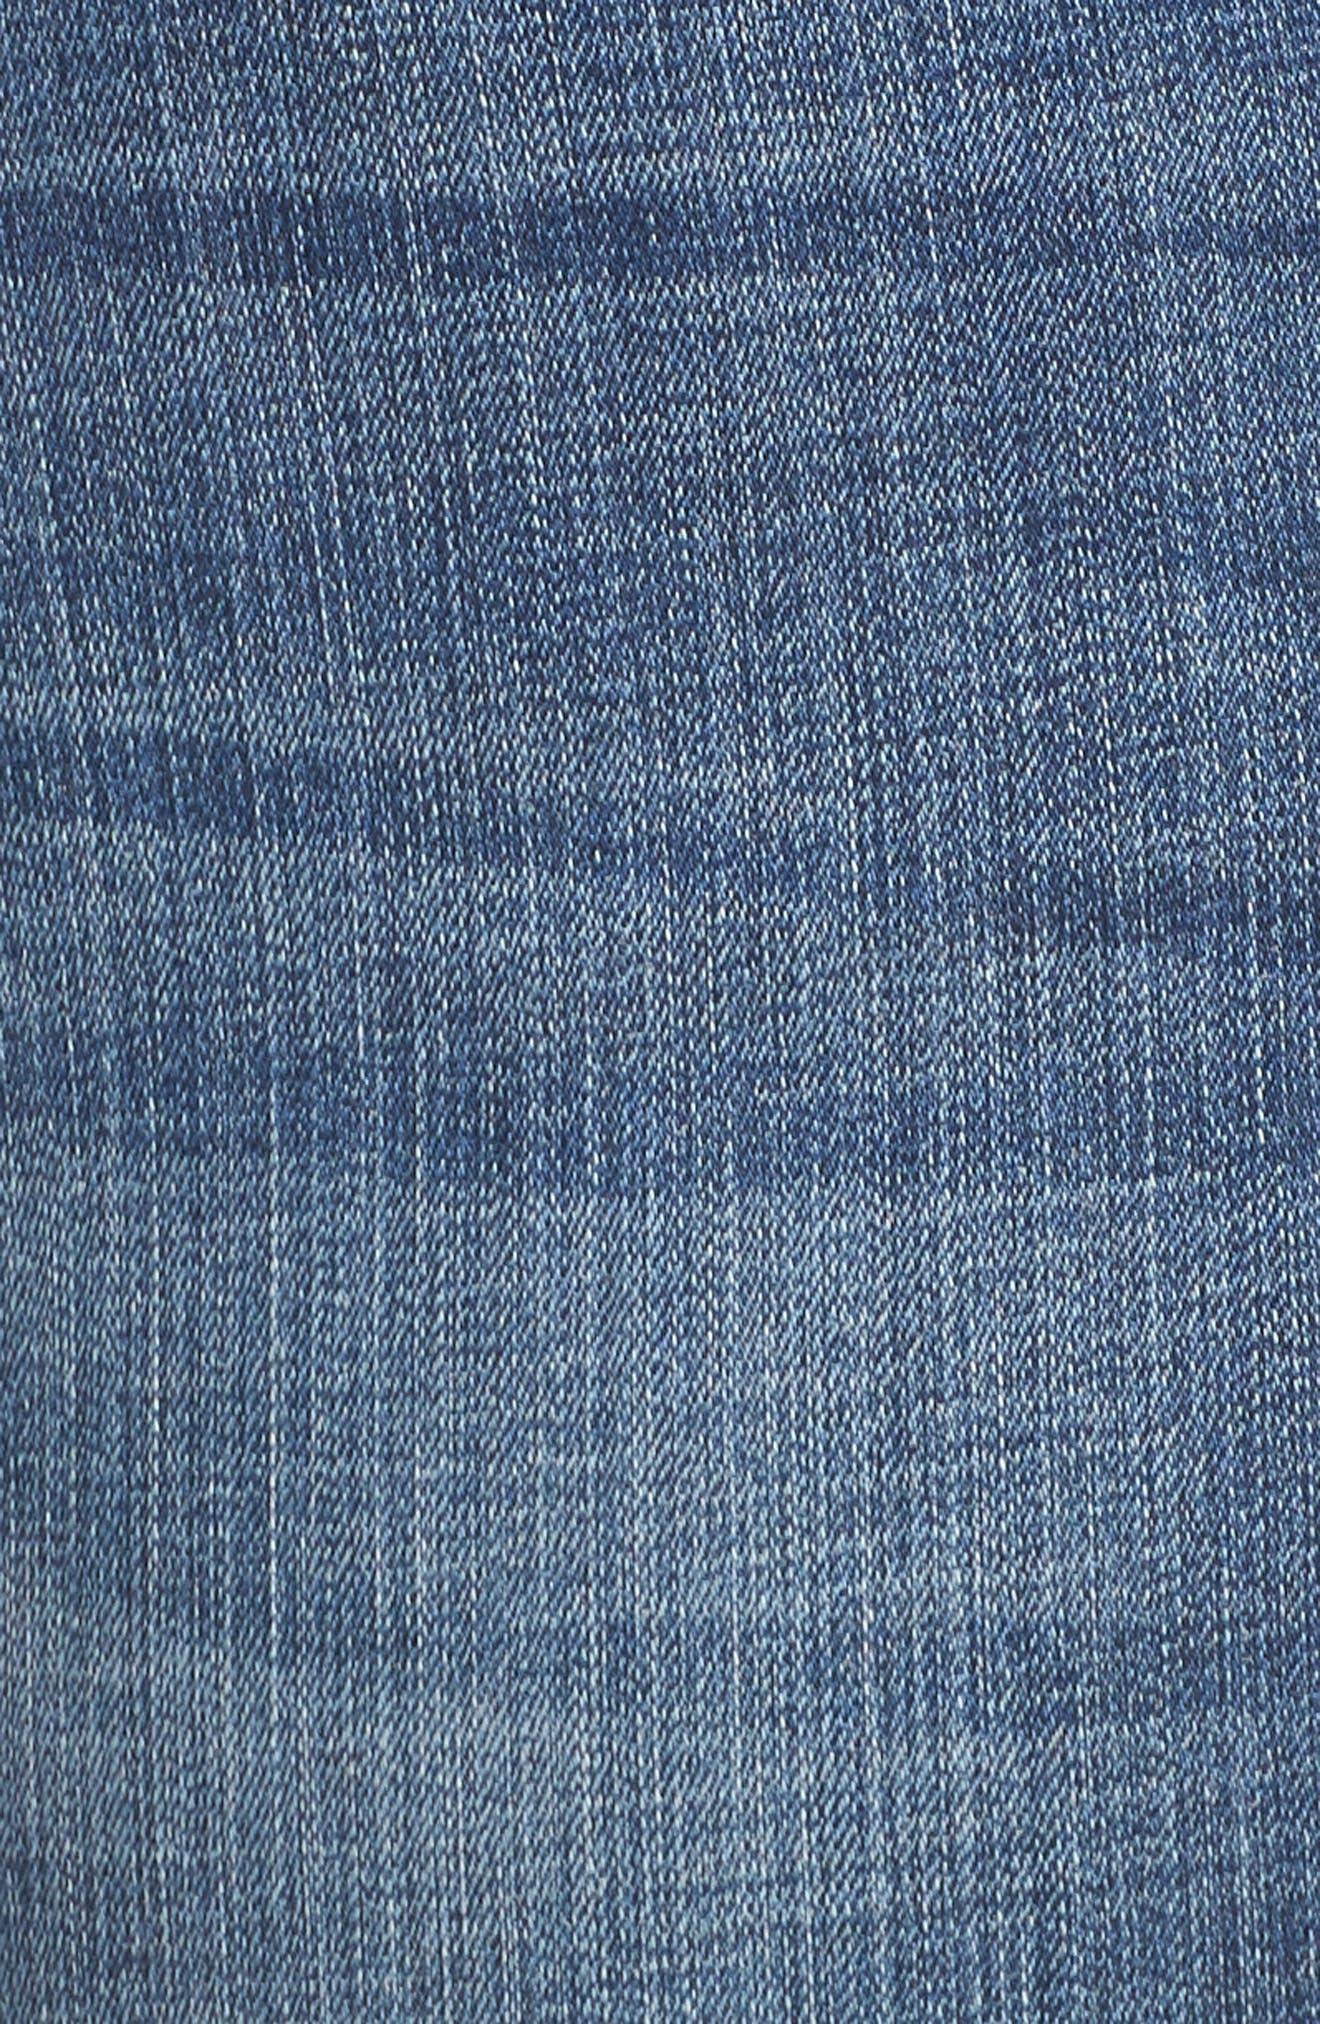 JAG JEANS, Eloise Bootcut Stretch Jeans, Alternate thumbnail 6, color, MED INDIGO